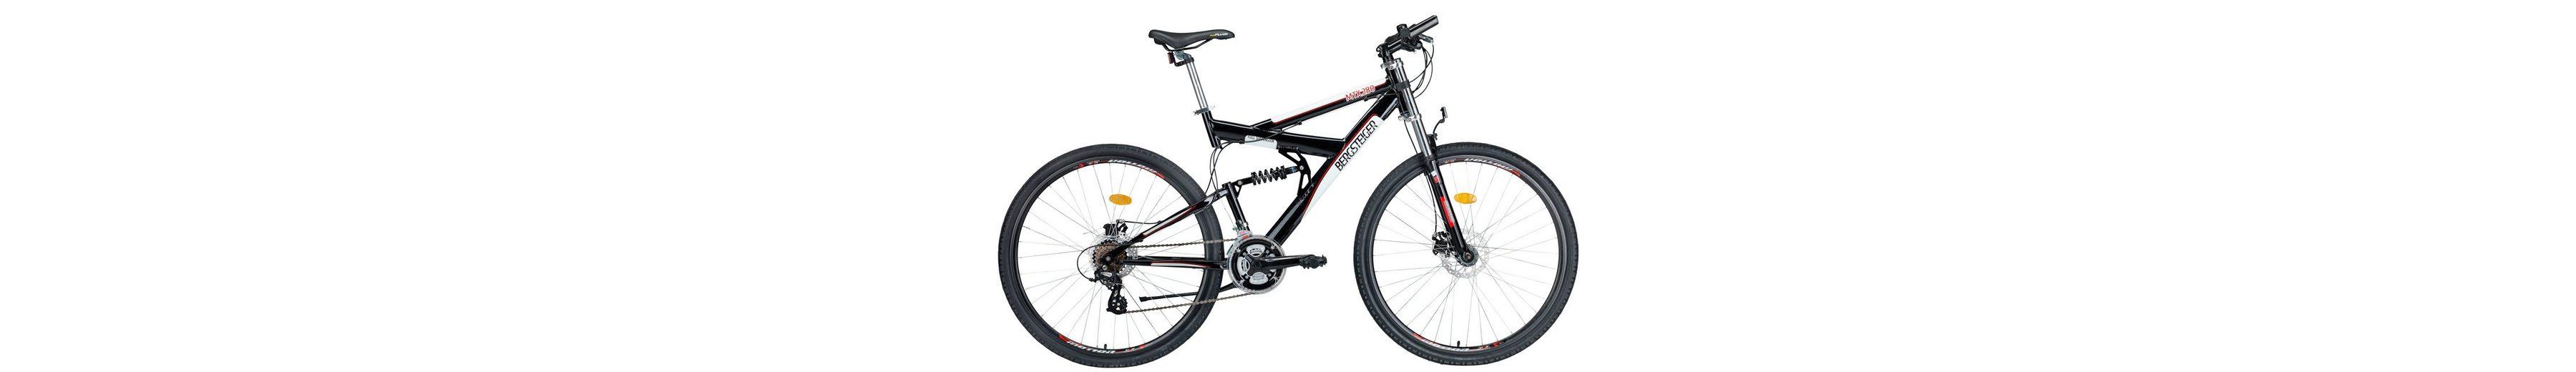 Mountainbike »MTX.280 71,12 cm (28 Zoll)«